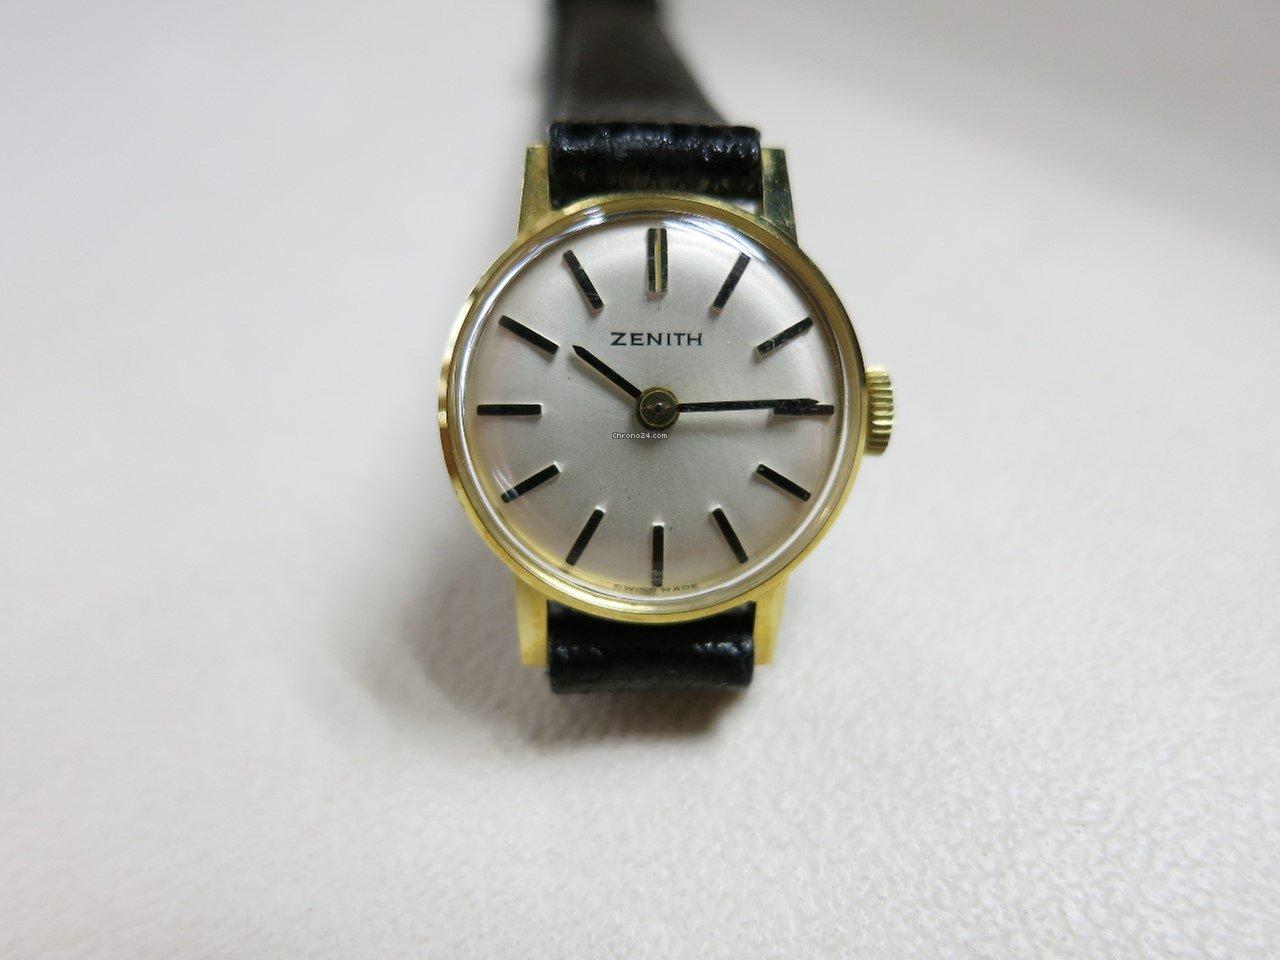 Prezzi degli orologi Zenith da donna  6e8b3dcd30